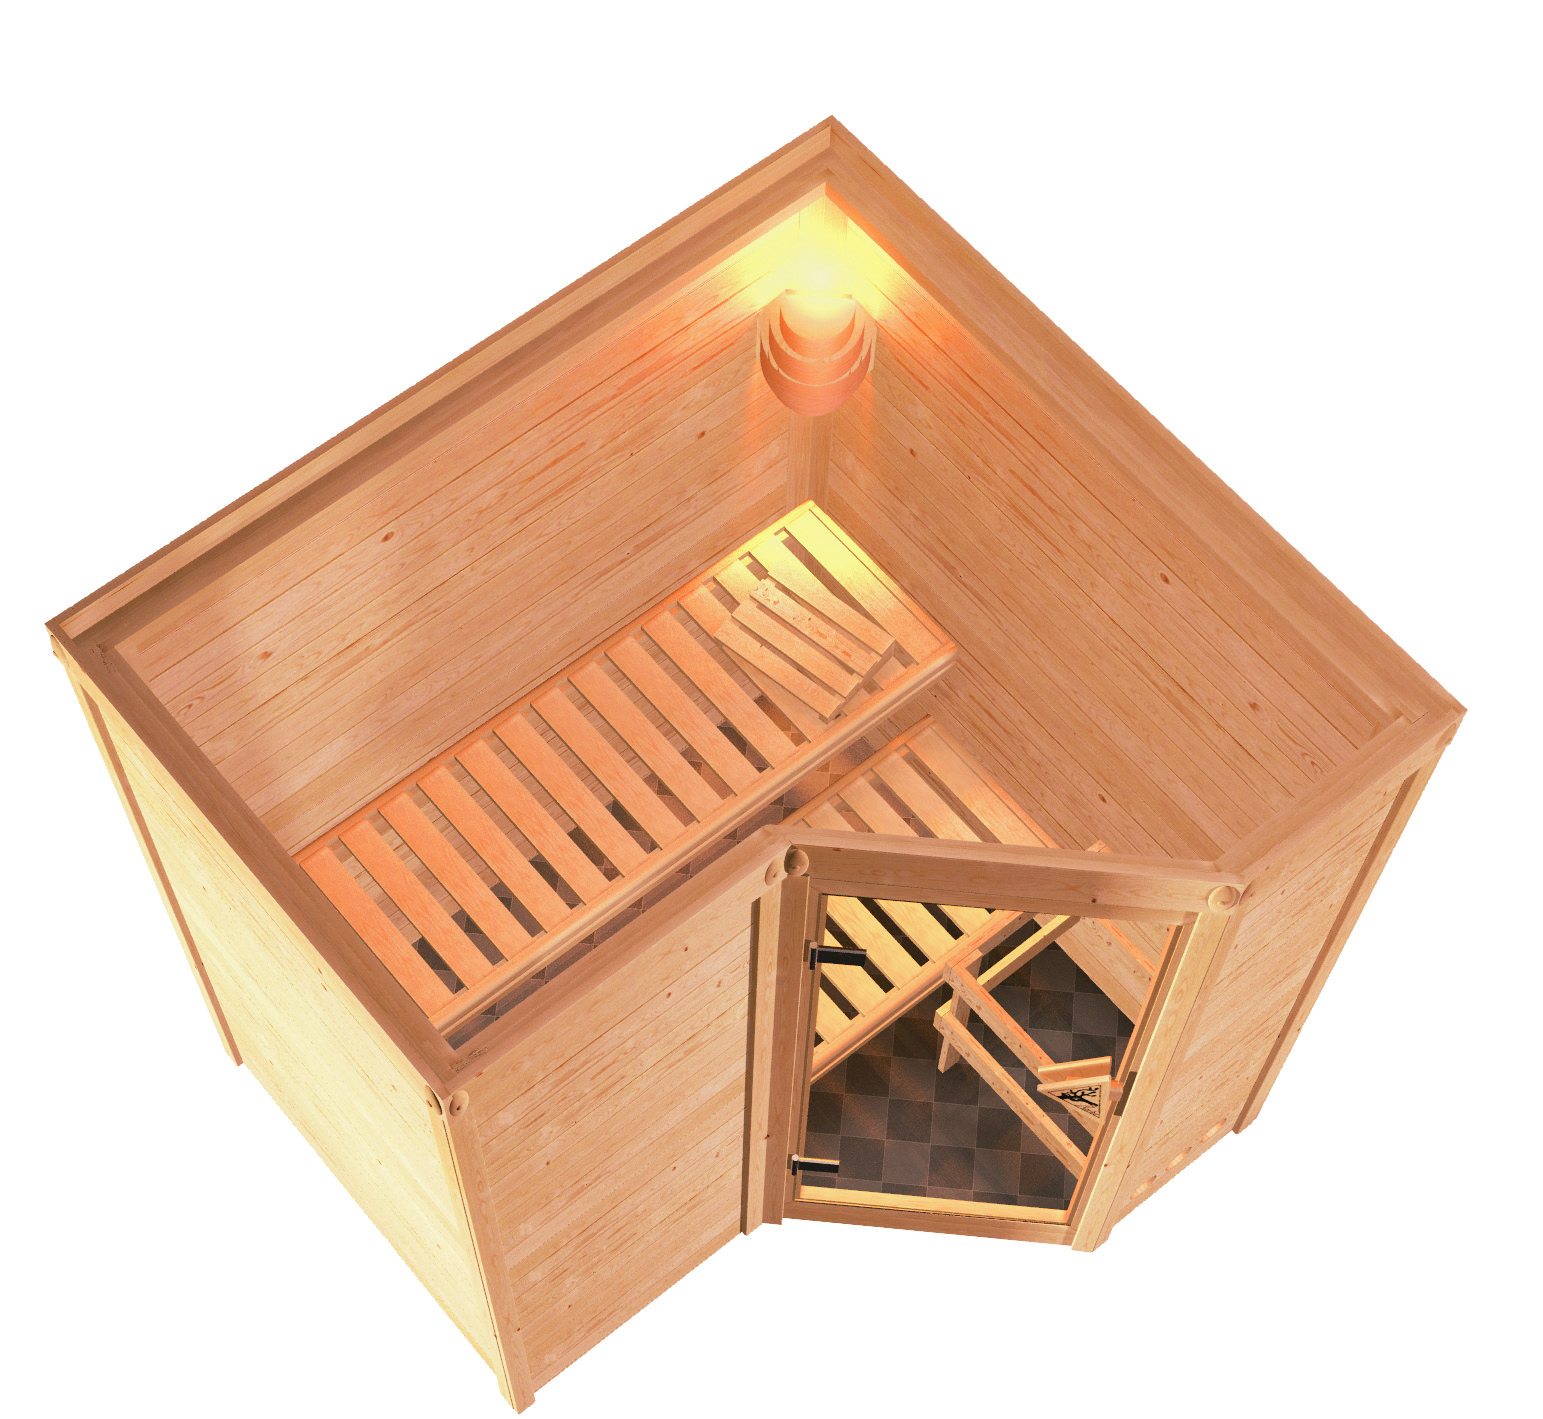 karibu massivholzsauna sahib 1 1 93 x 1 84 m 40 mm mit 9 kw ofen sauna heimsauna ebay. Black Bedroom Furniture Sets. Home Design Ideas